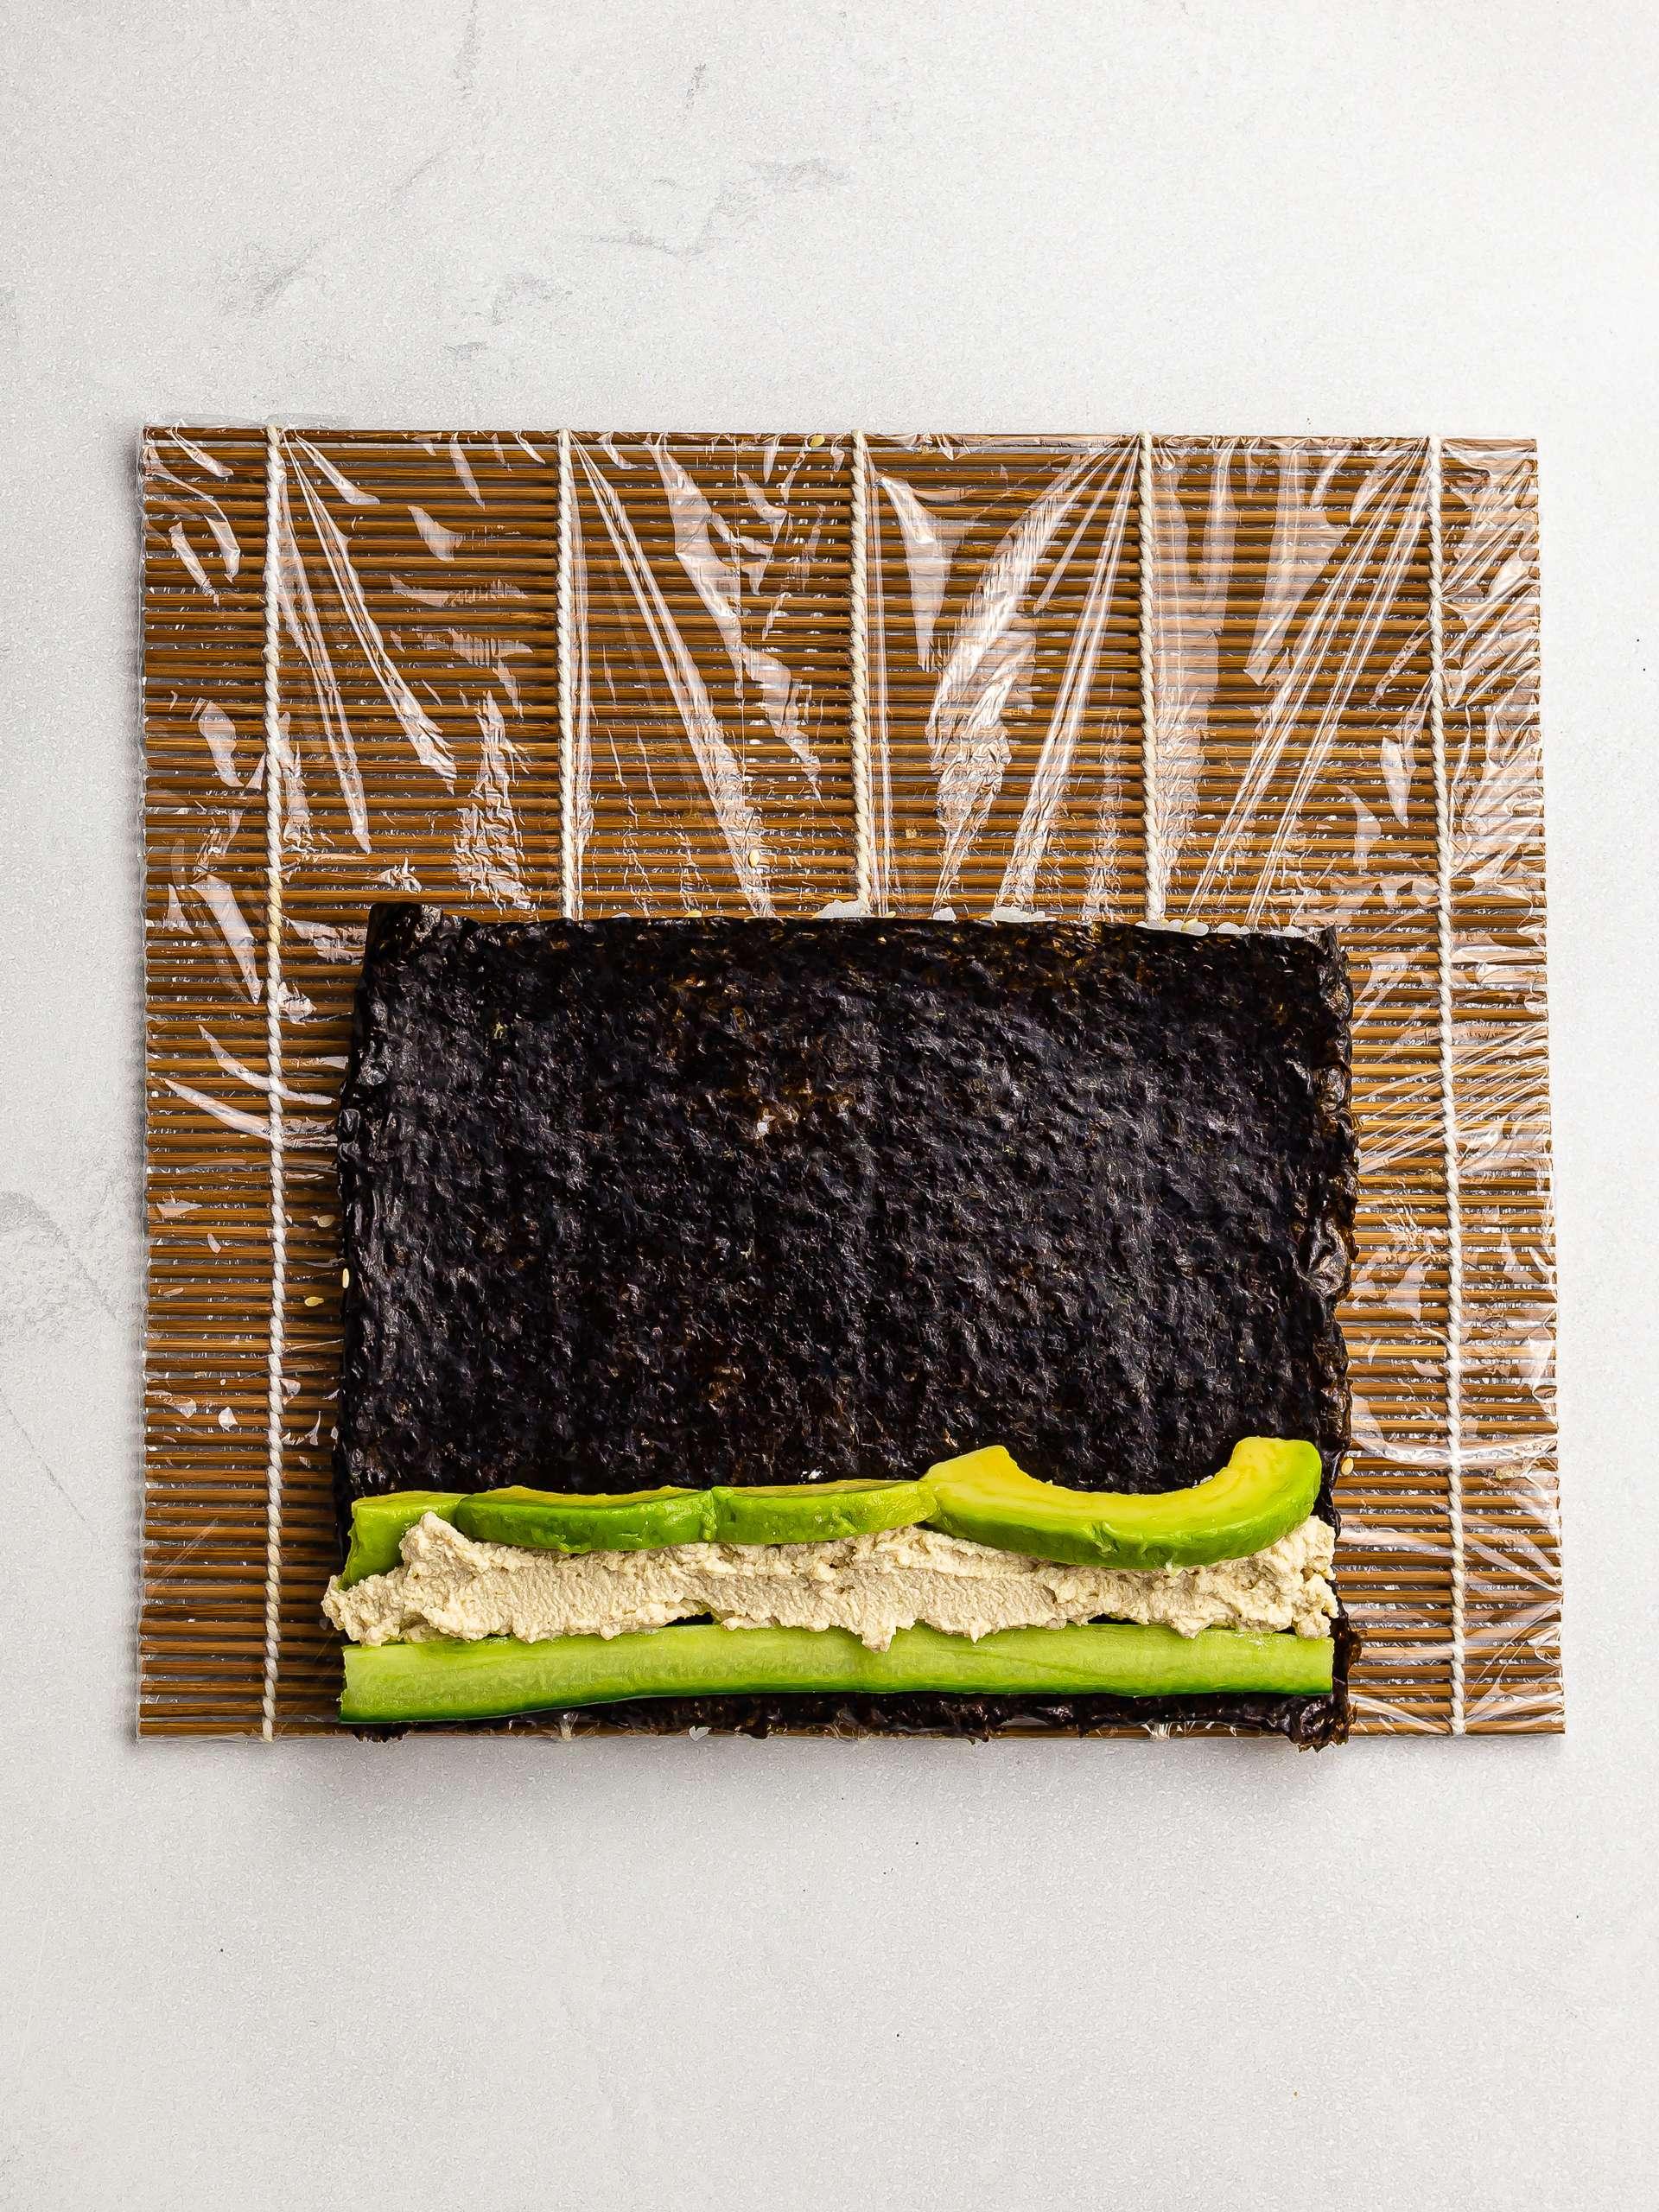 nori sheet with cucumber tofu and avocado